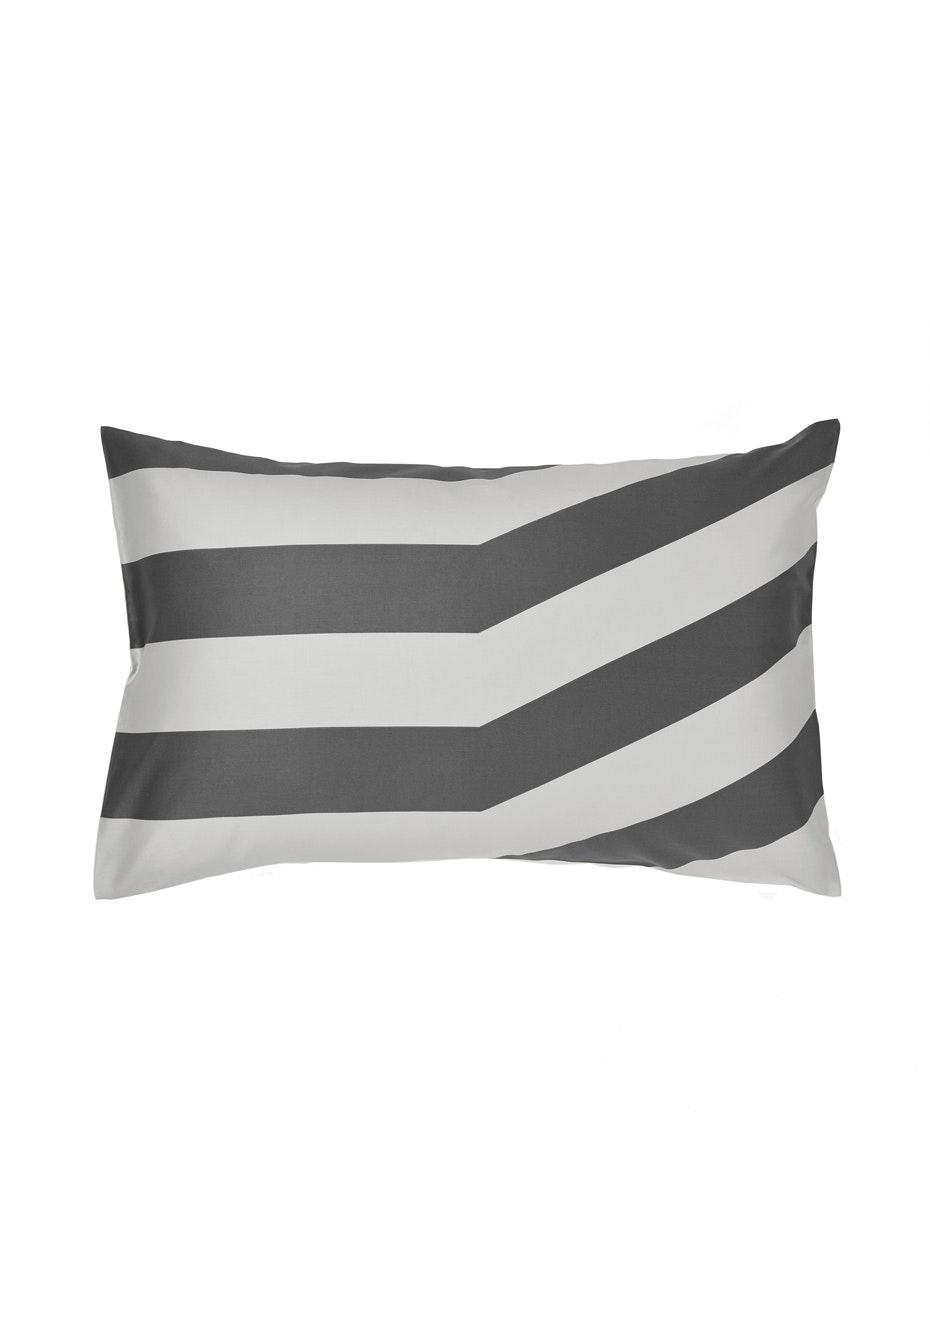 Aura Tltd Stripe Standard Pillowcase - Standard Charcoal